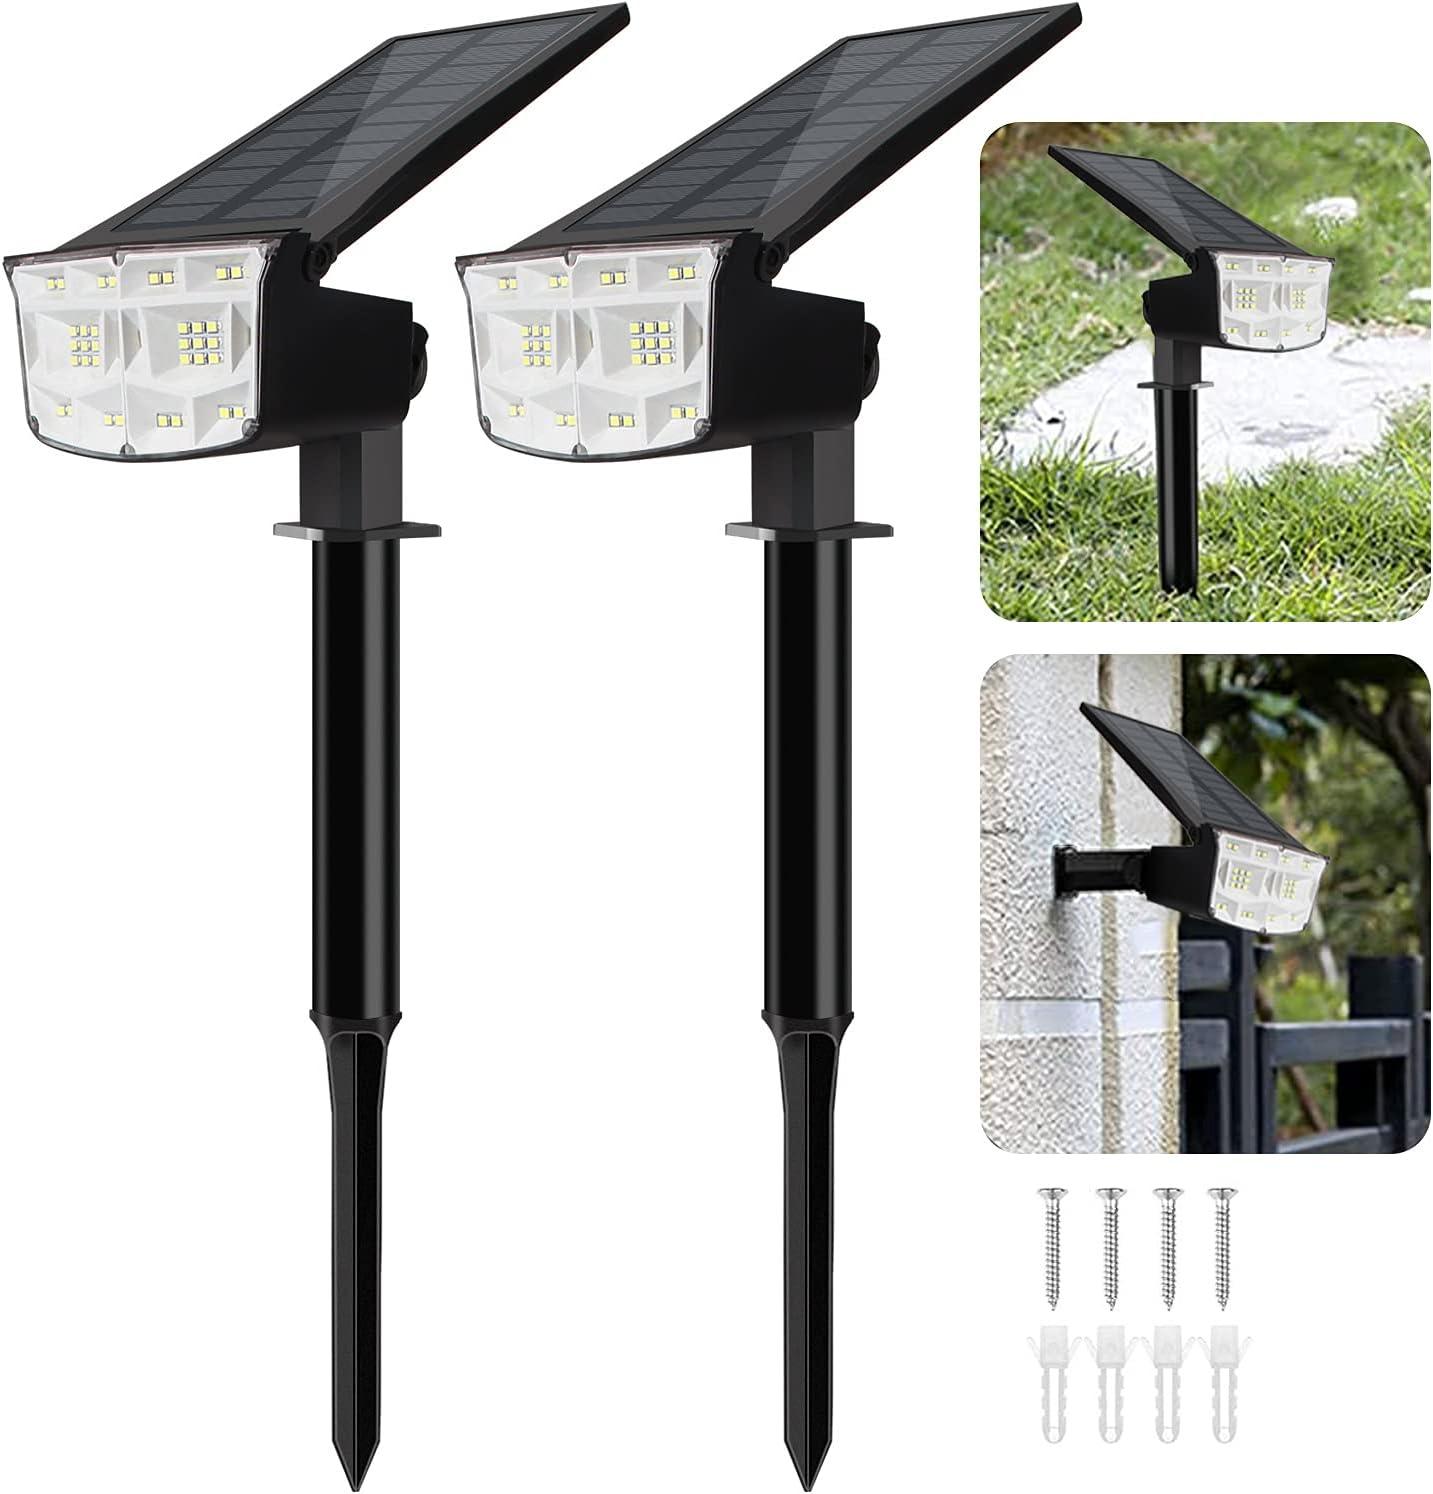 Adamstar Solar Lights Outdoor,Solar Yard Lights,38-Led Solar Landscape Lights Spotlights,Wall Light 2 in 1,Ip67 Waterproof Solar Garden Lights for Lawn Patio Yard, Walkway Deck Driveway,2 Modes